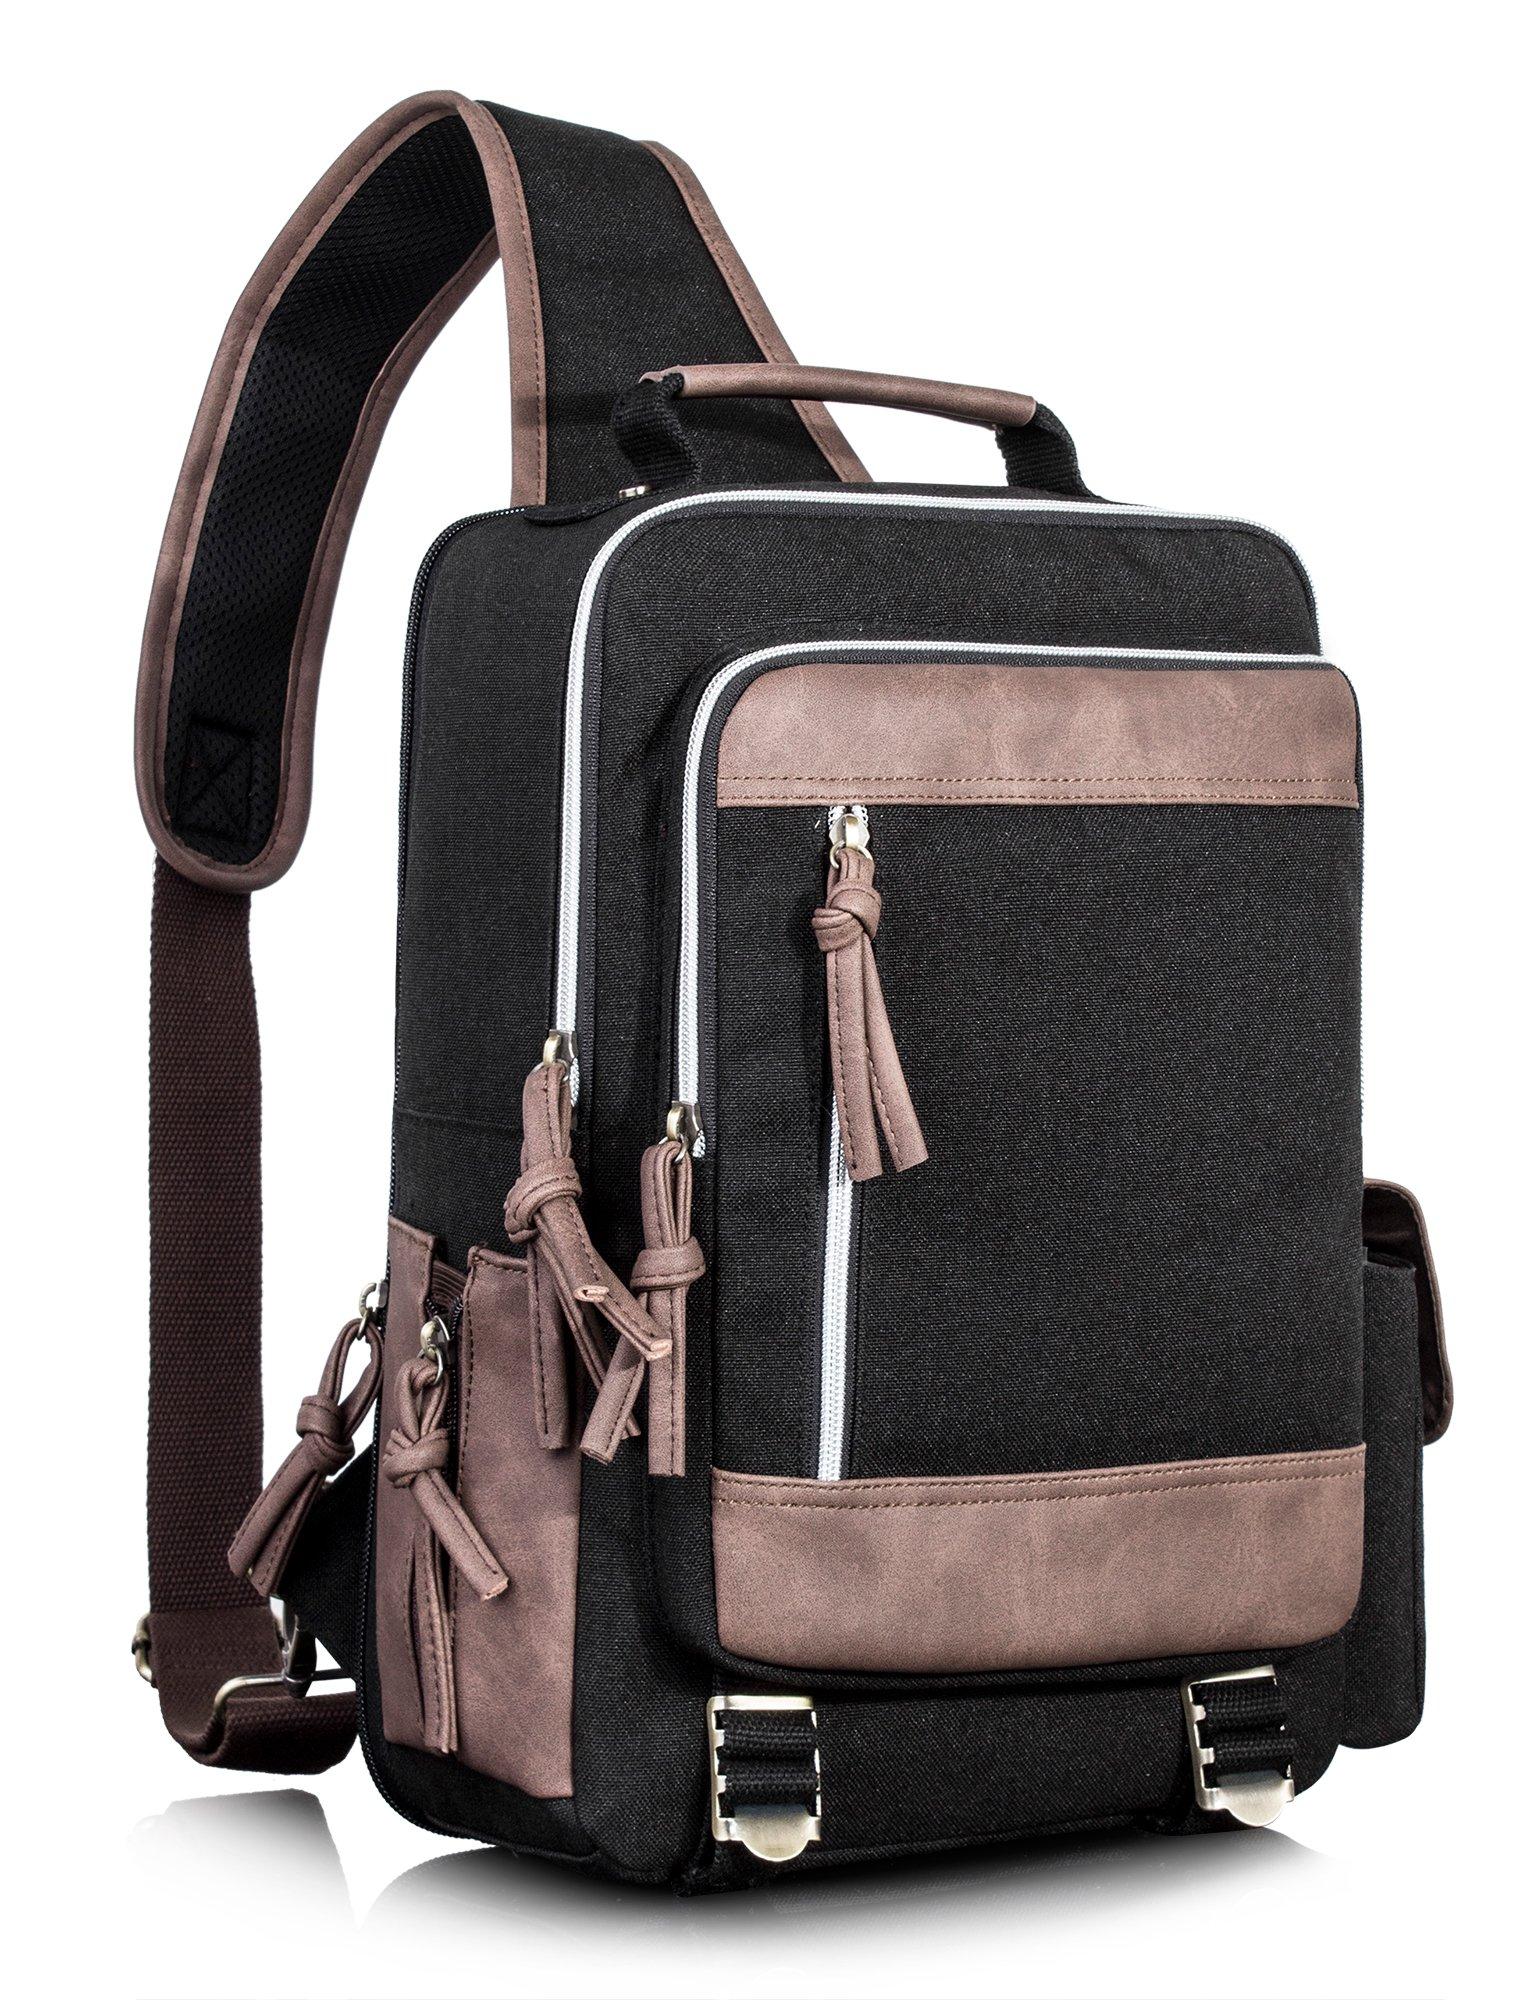 Leaper Retro Messenger Bag Outdoor Cross Body Sling Bag Travel Bag Shoulder Backpack (Black3103)